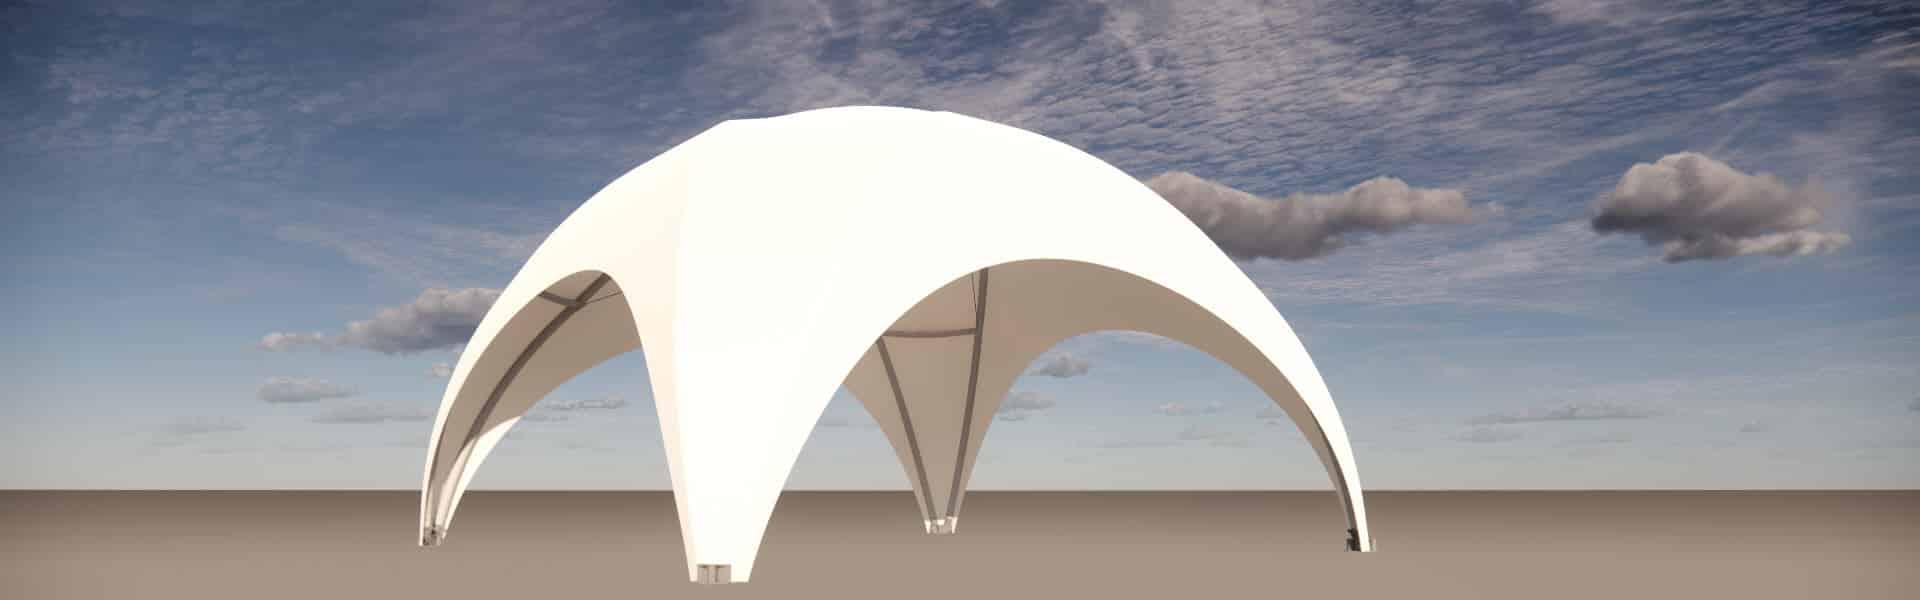 Kuppelbau 6x6 überdacht-36-Quadratmeter